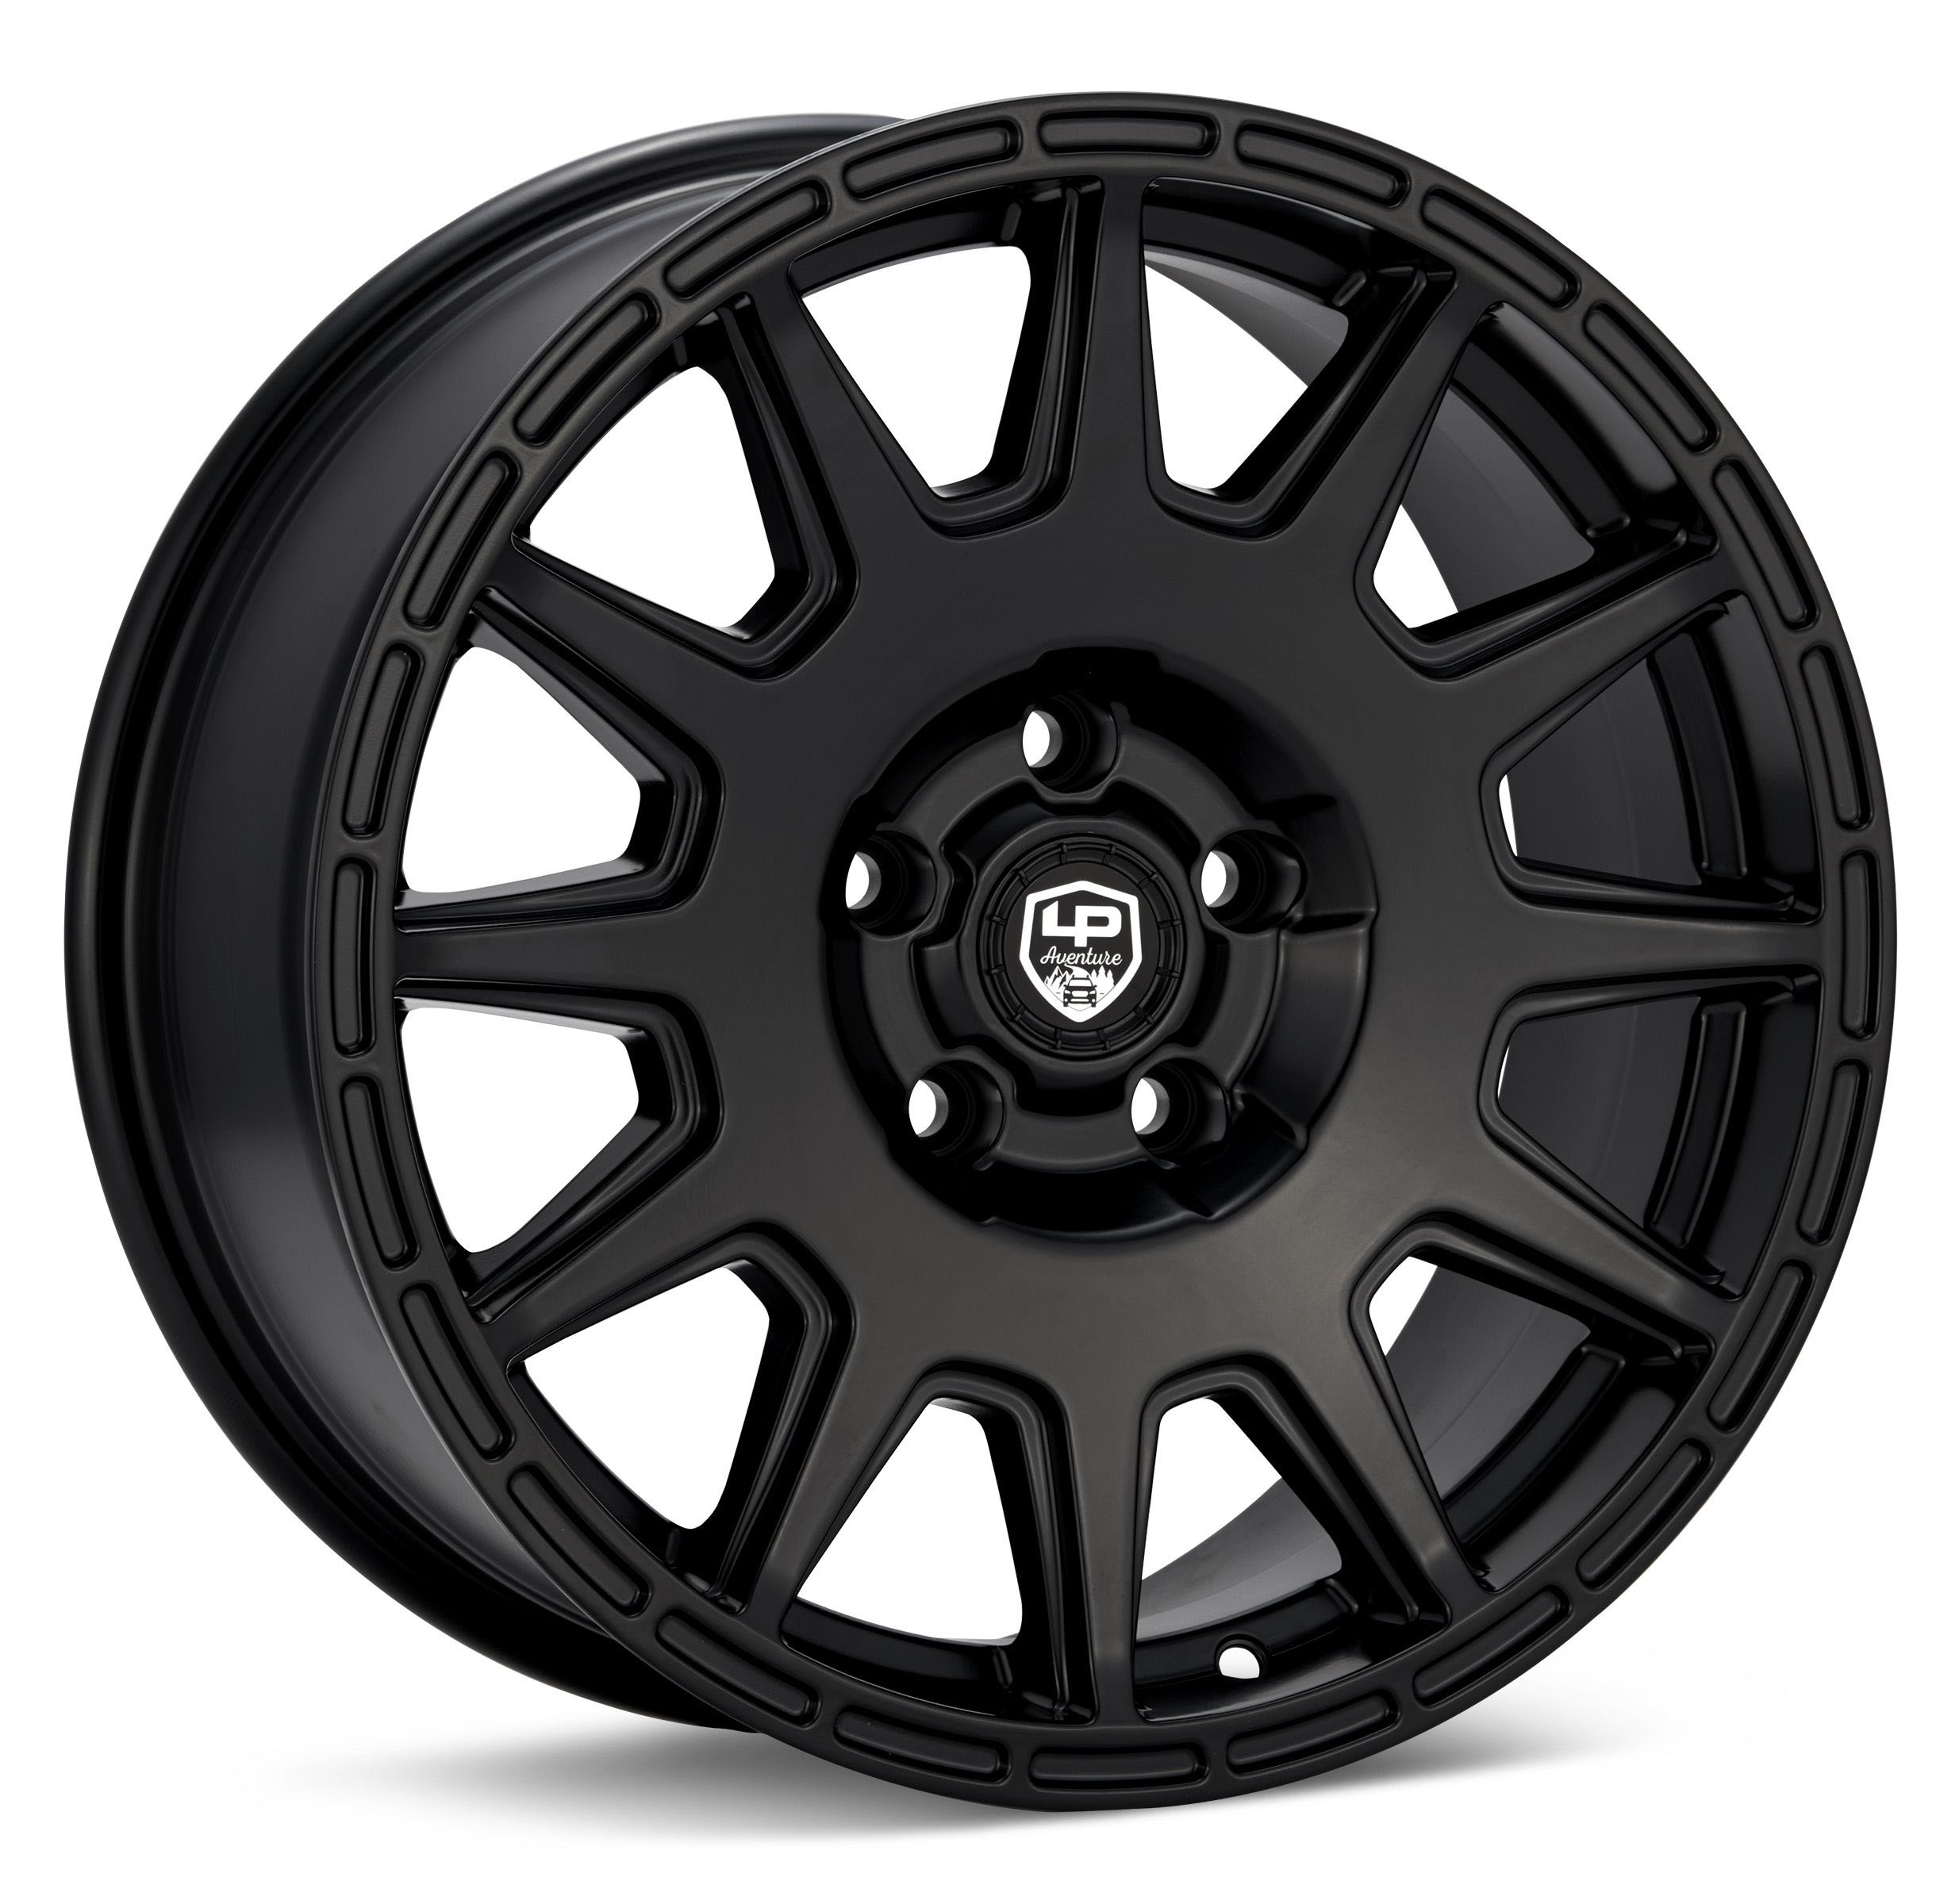 LP Aventure Wheel 17X7.5 +35 5x114.3 Matte Black